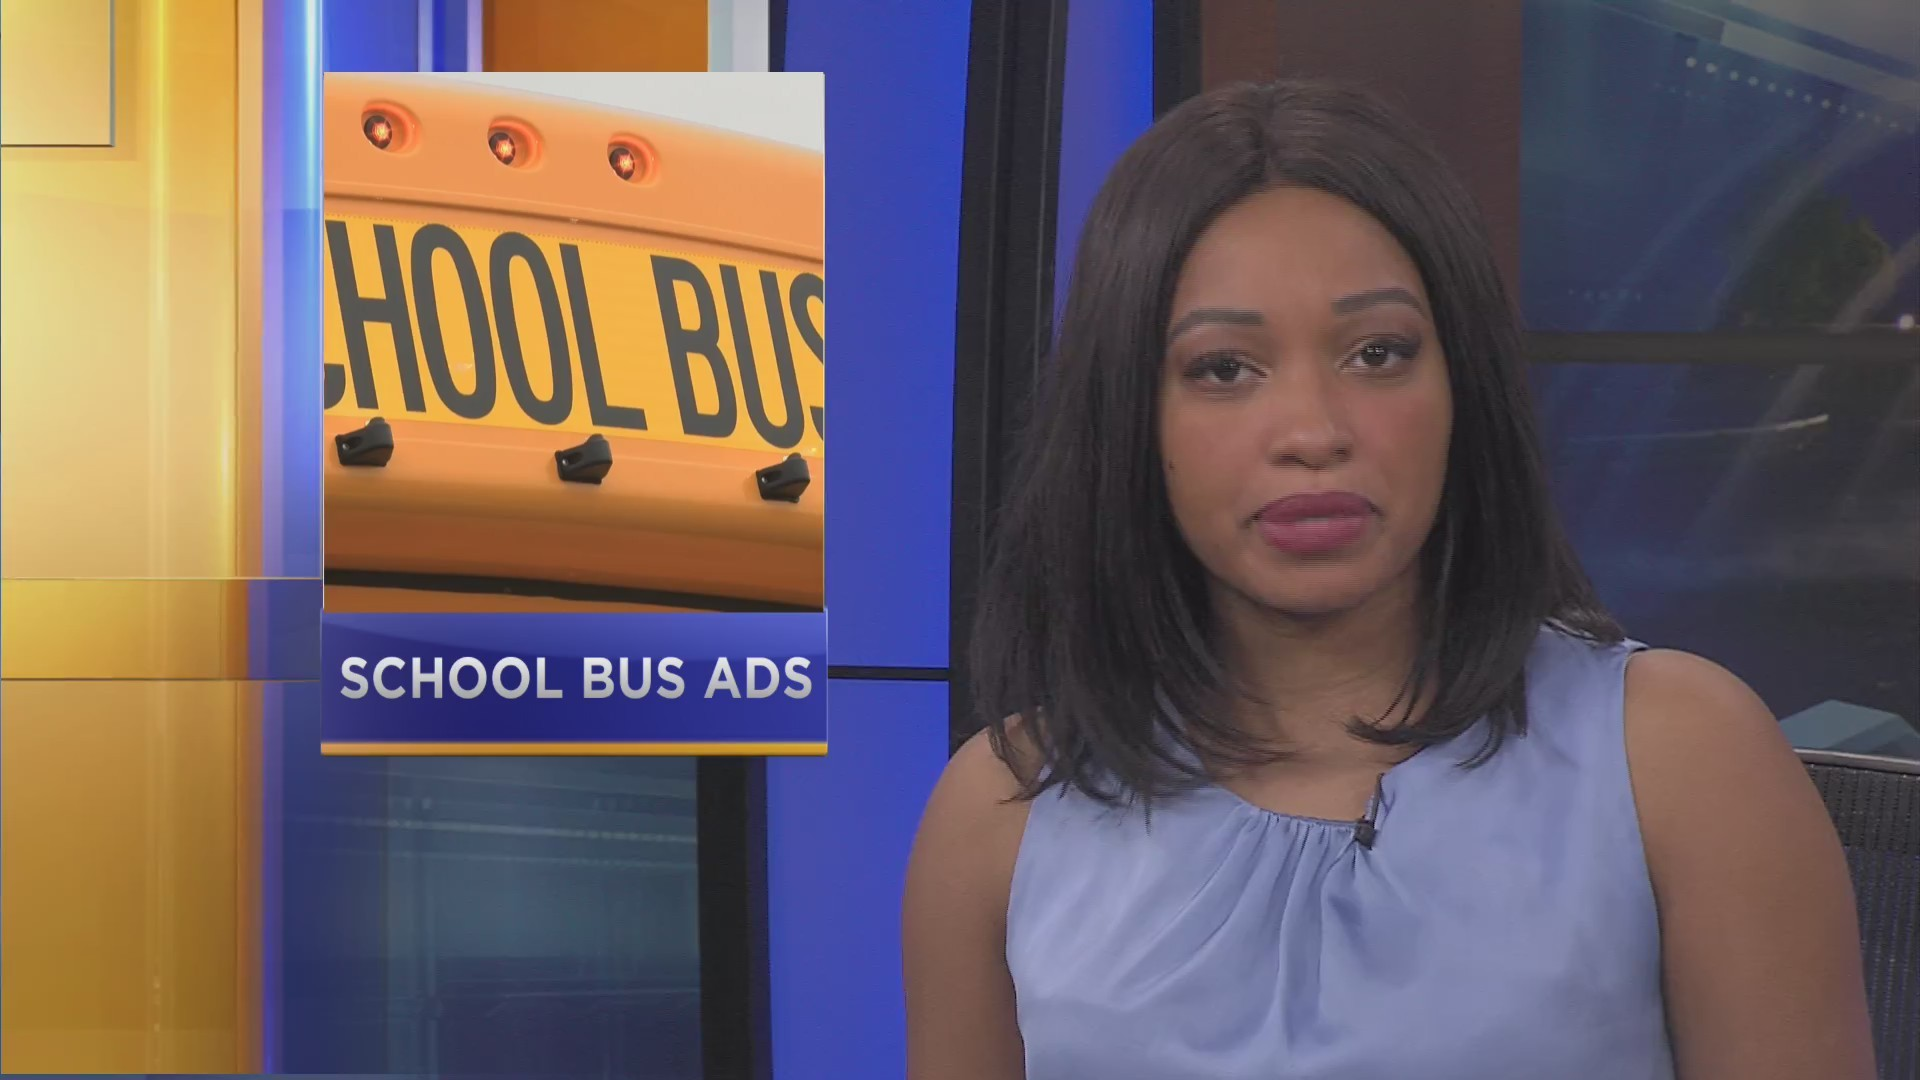 School_Bus_ads_9_20190104034158